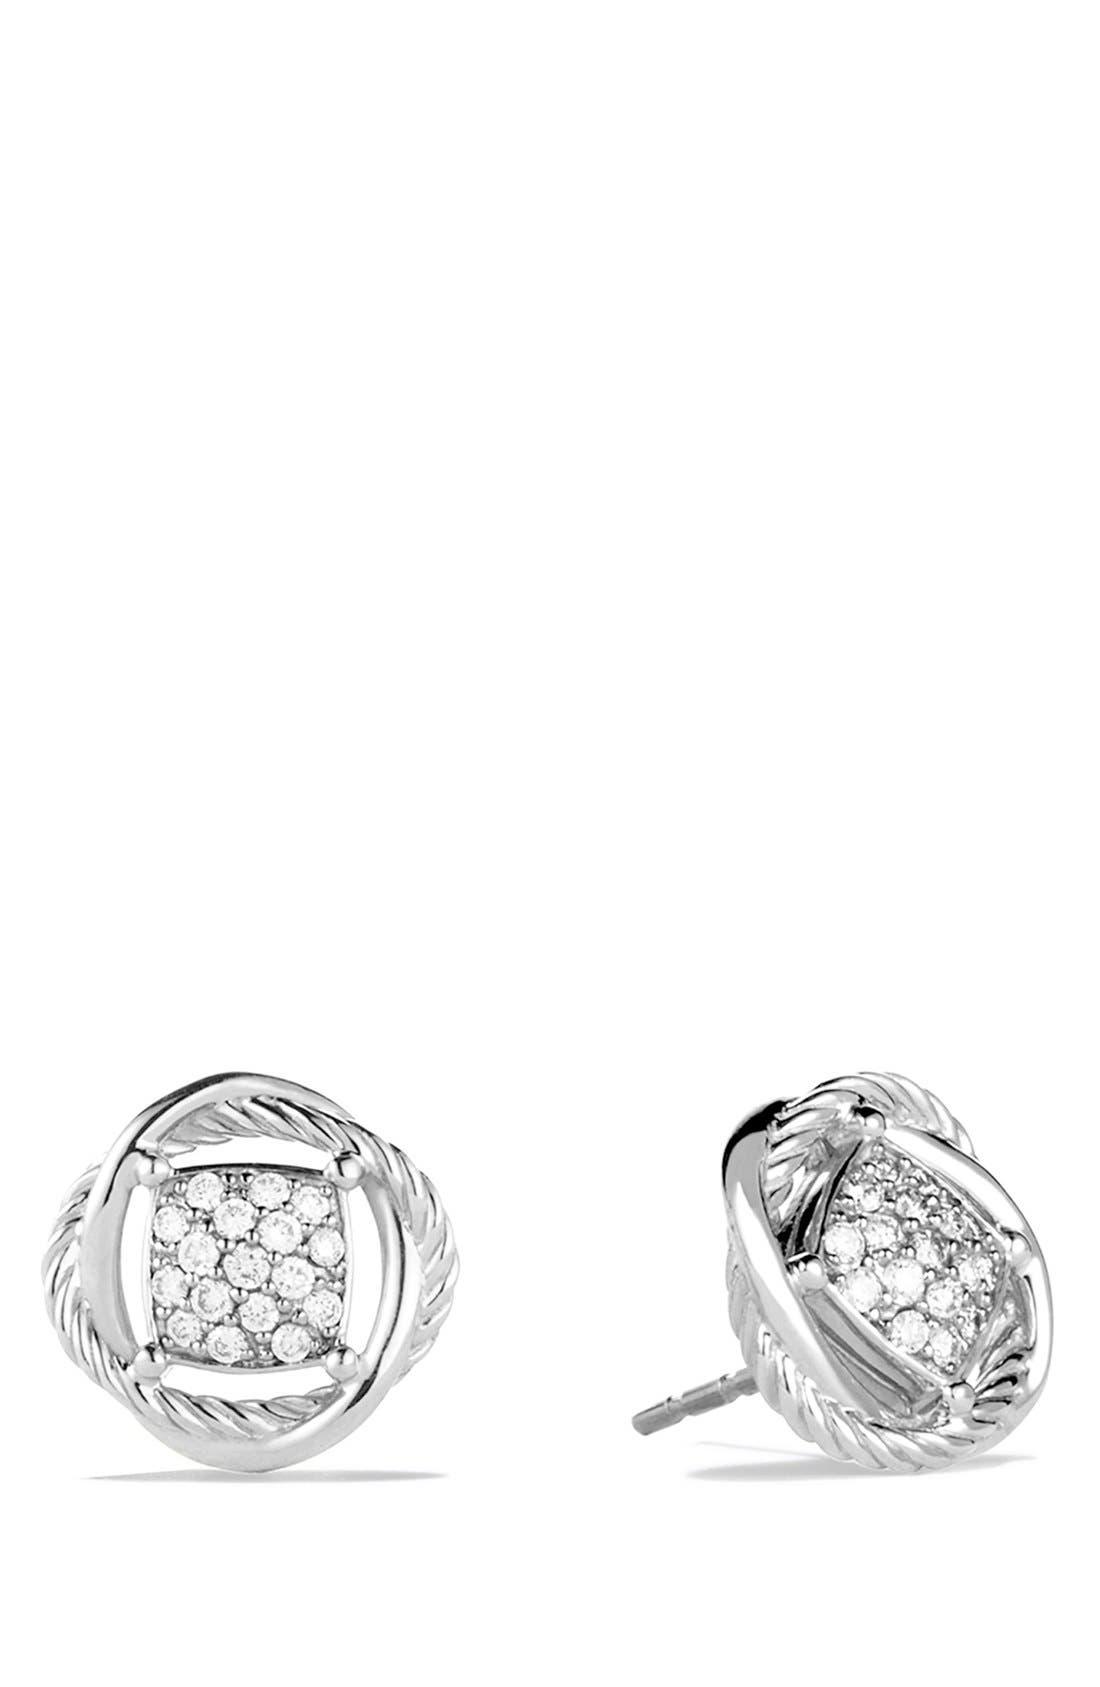 DAVID YURMAN, 'Infinity' Pavé Diamond Stud Earrings, Main thumbnail 1, color, DIAMOND